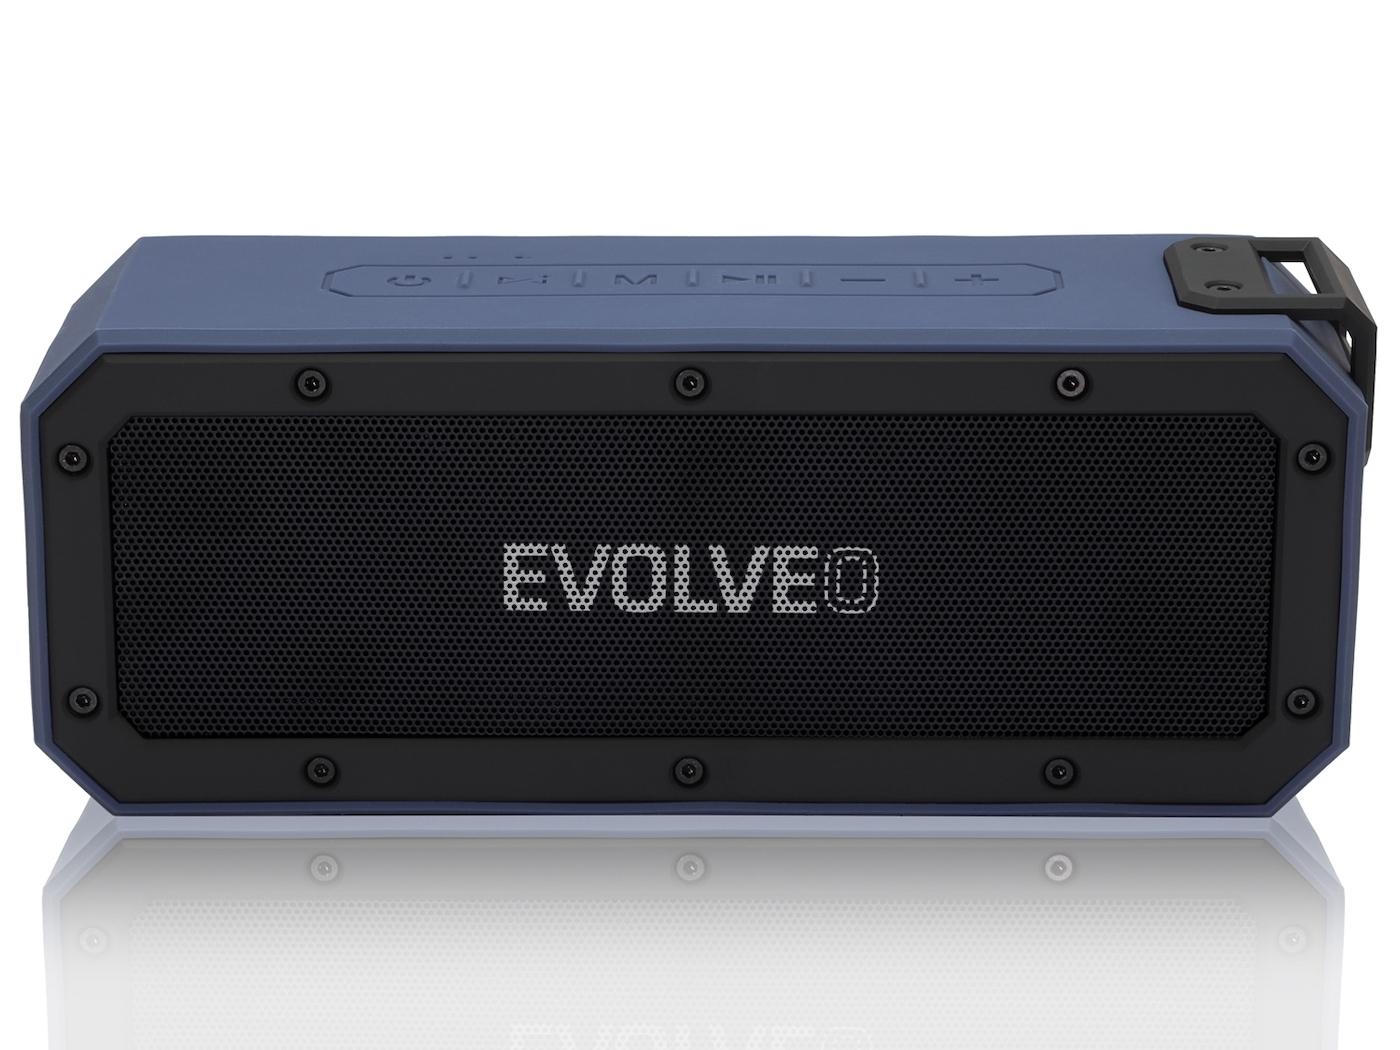 EVOLVEO Armor 0